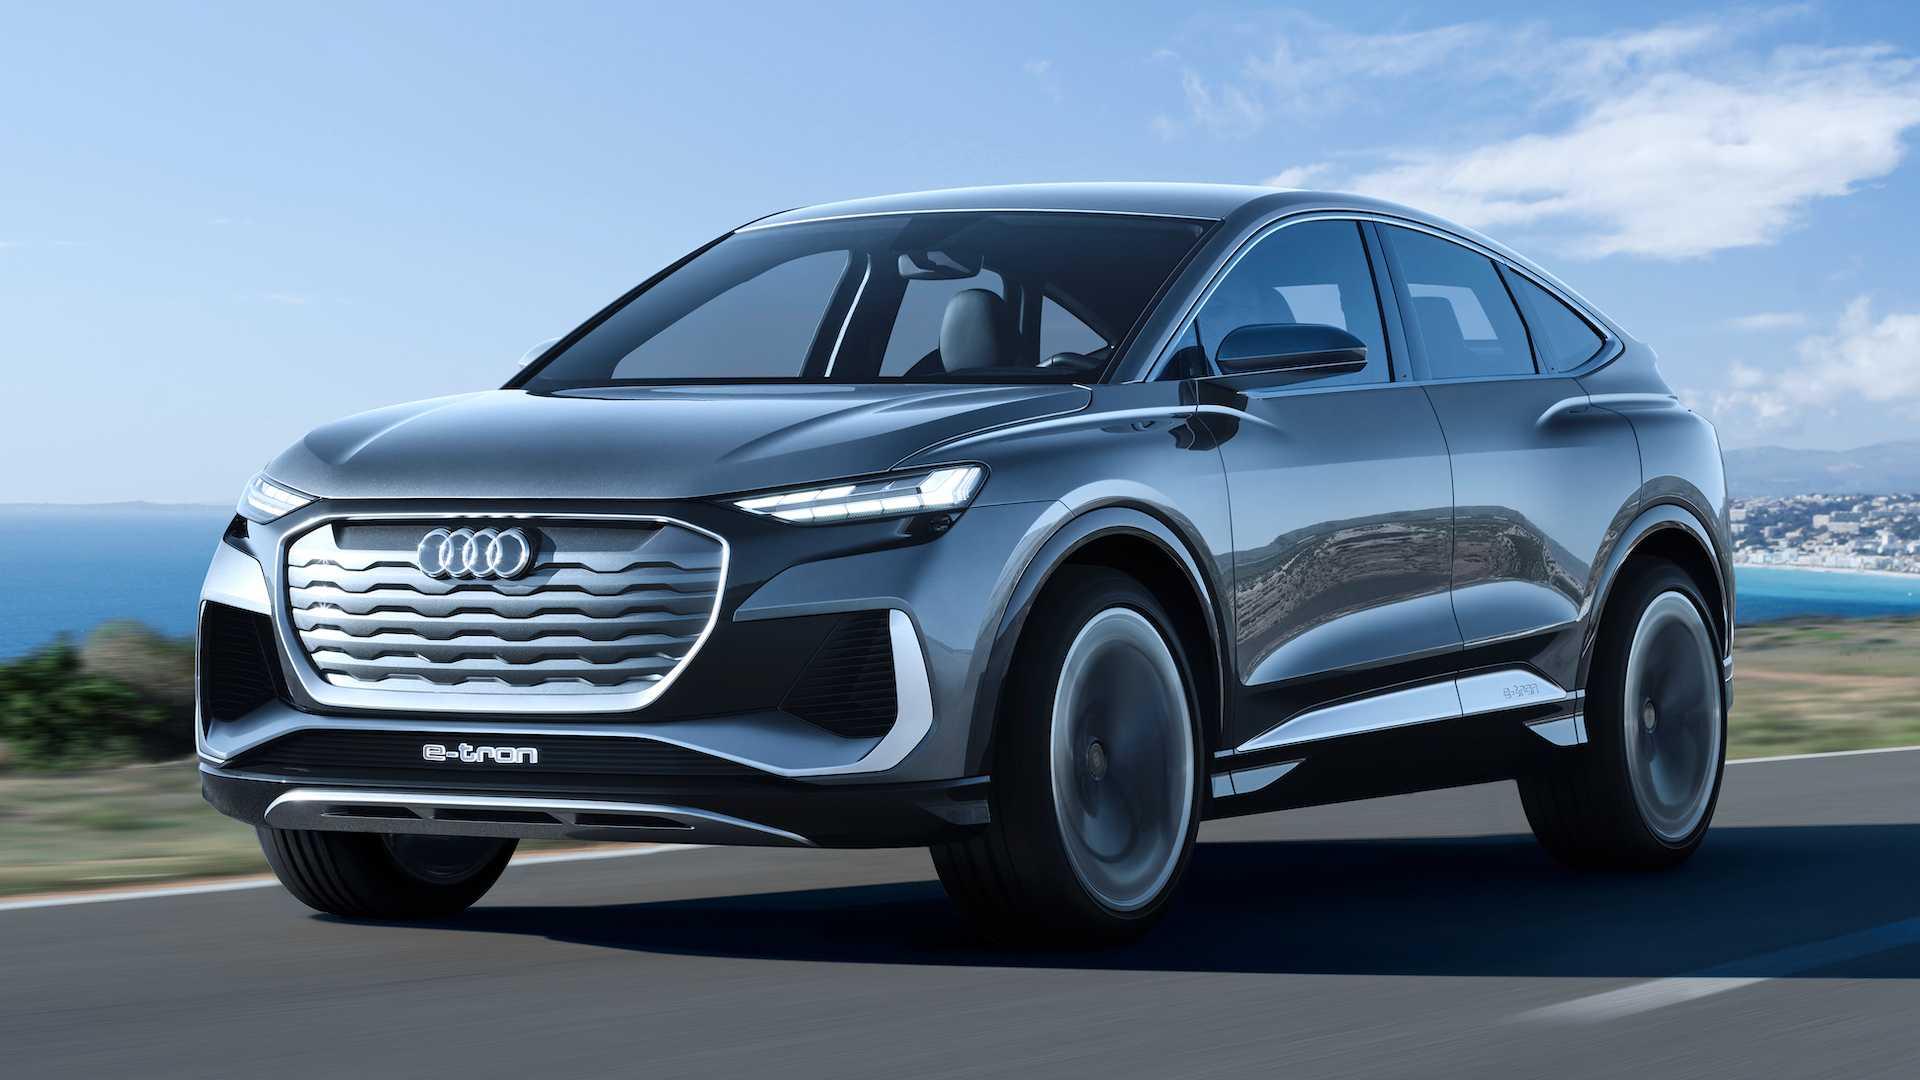 Kekurangan Audi Q4 Etron Perbandingan Harga